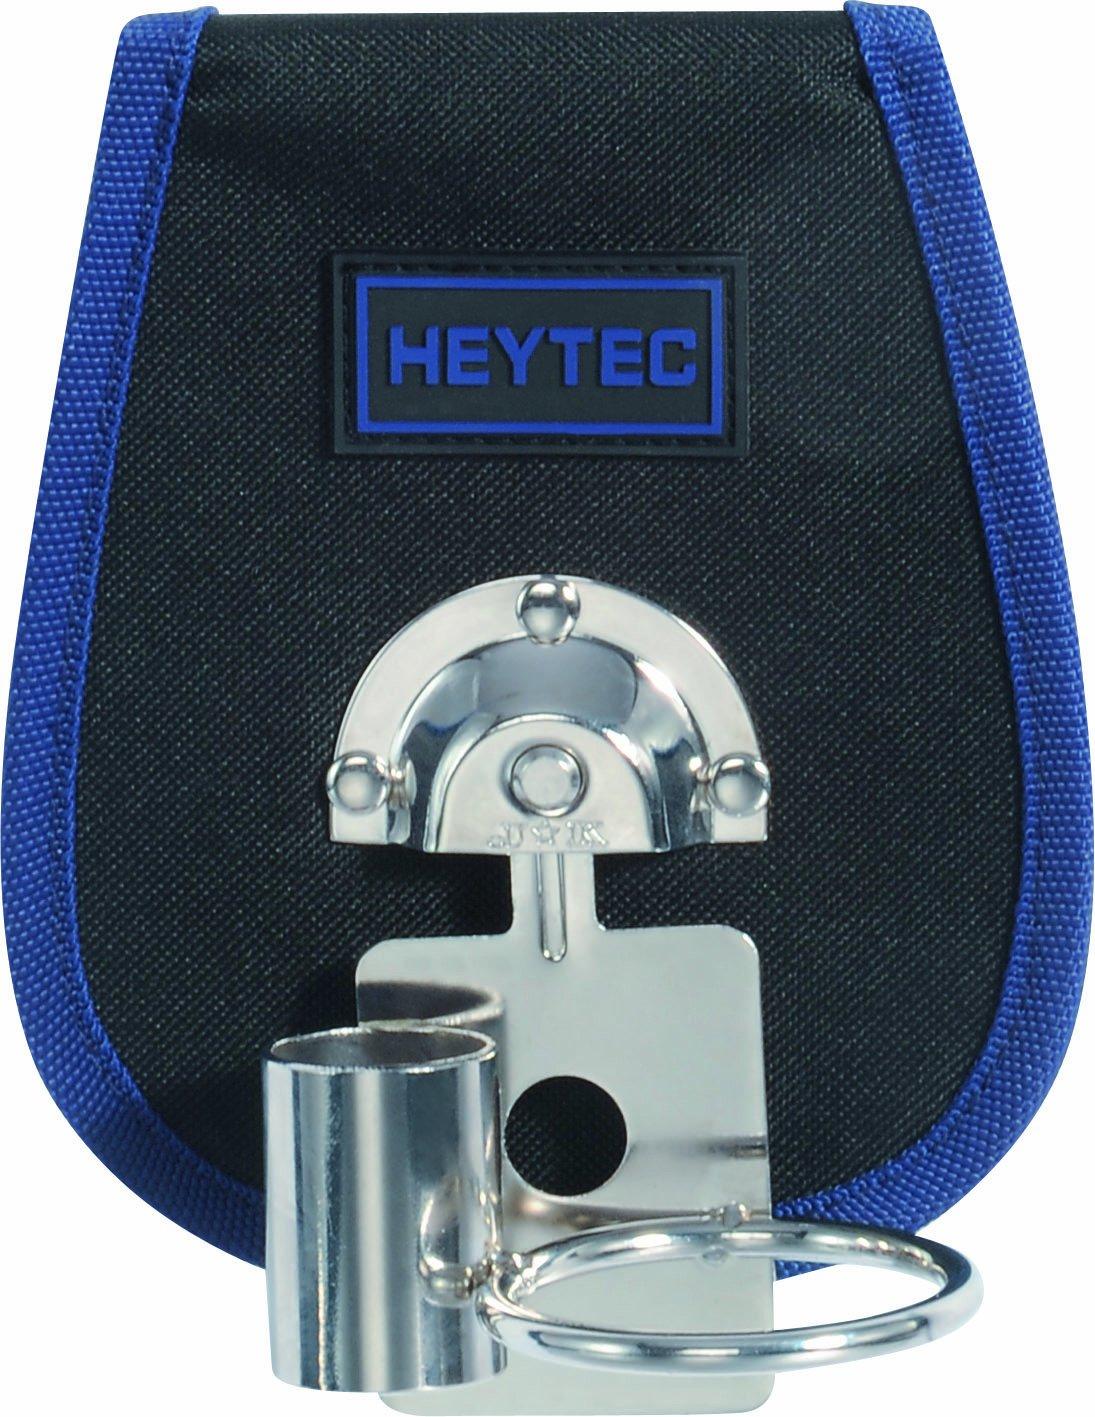 Heyco/Heytec 50880700400 É tui de ceinture porte-marteau Heytec Heyco